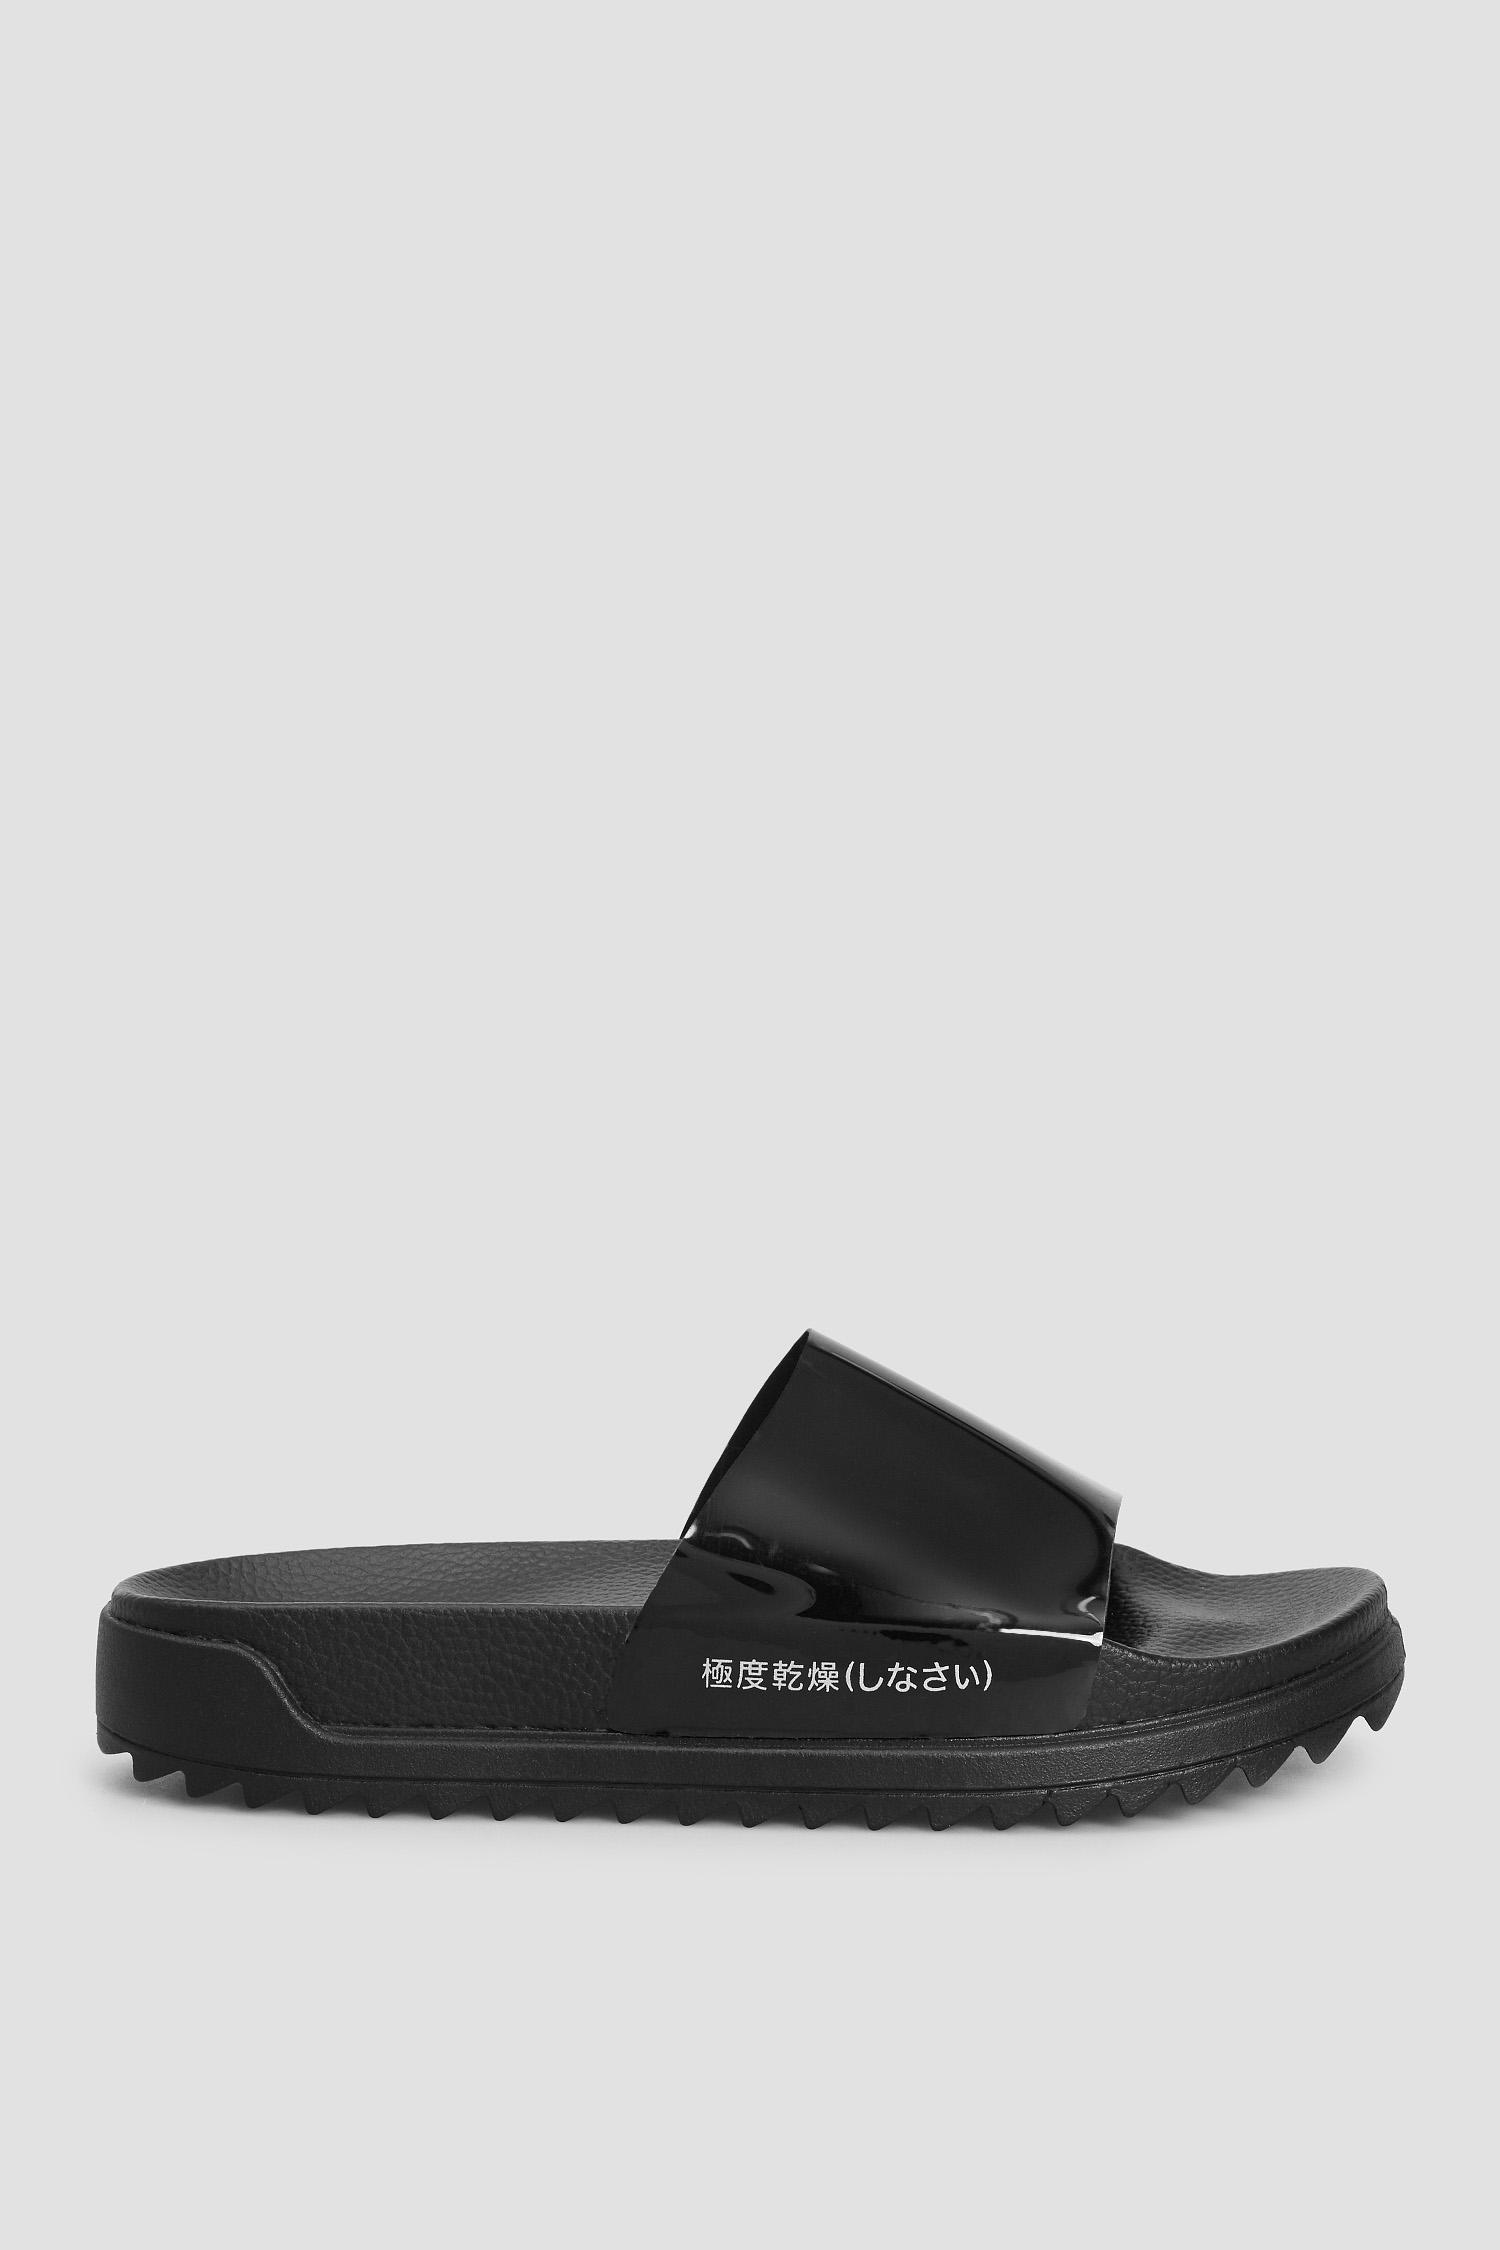 Чорні слайдери для дівчат SuperDry WF310026A;02A